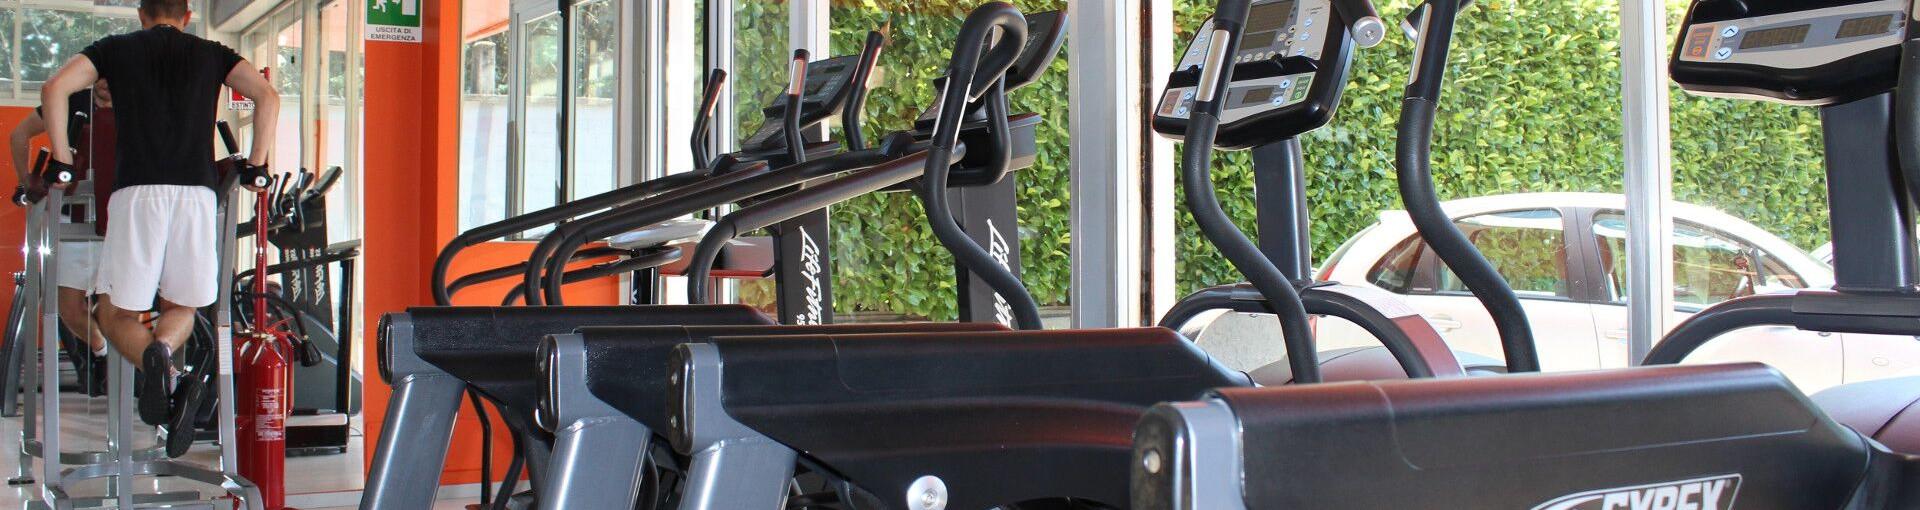 Ambition Fitness - Legnano